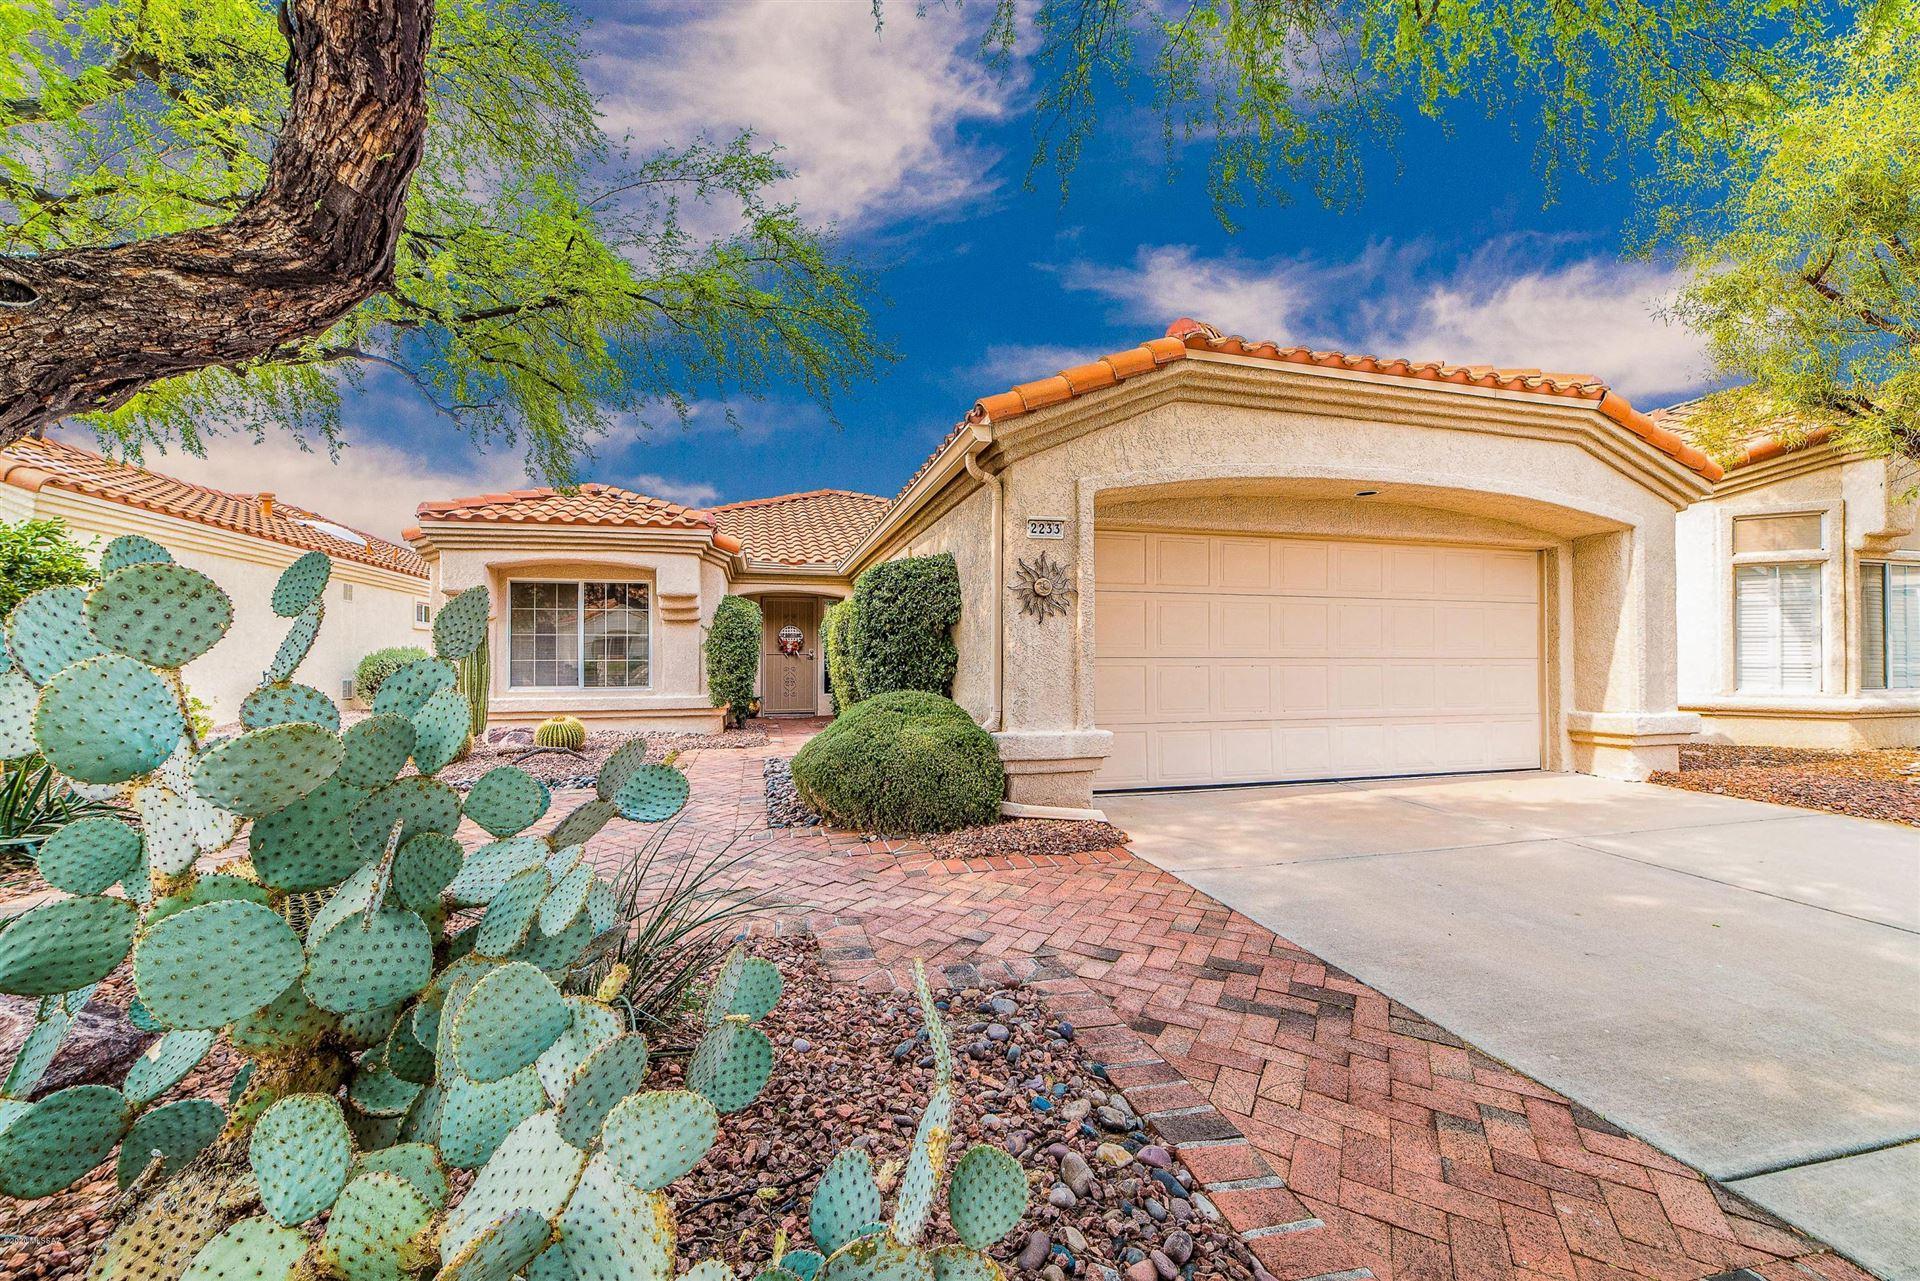 2233 E Amaranth Street, Oro Valley, AZ 85755 - MLS#: 22022554